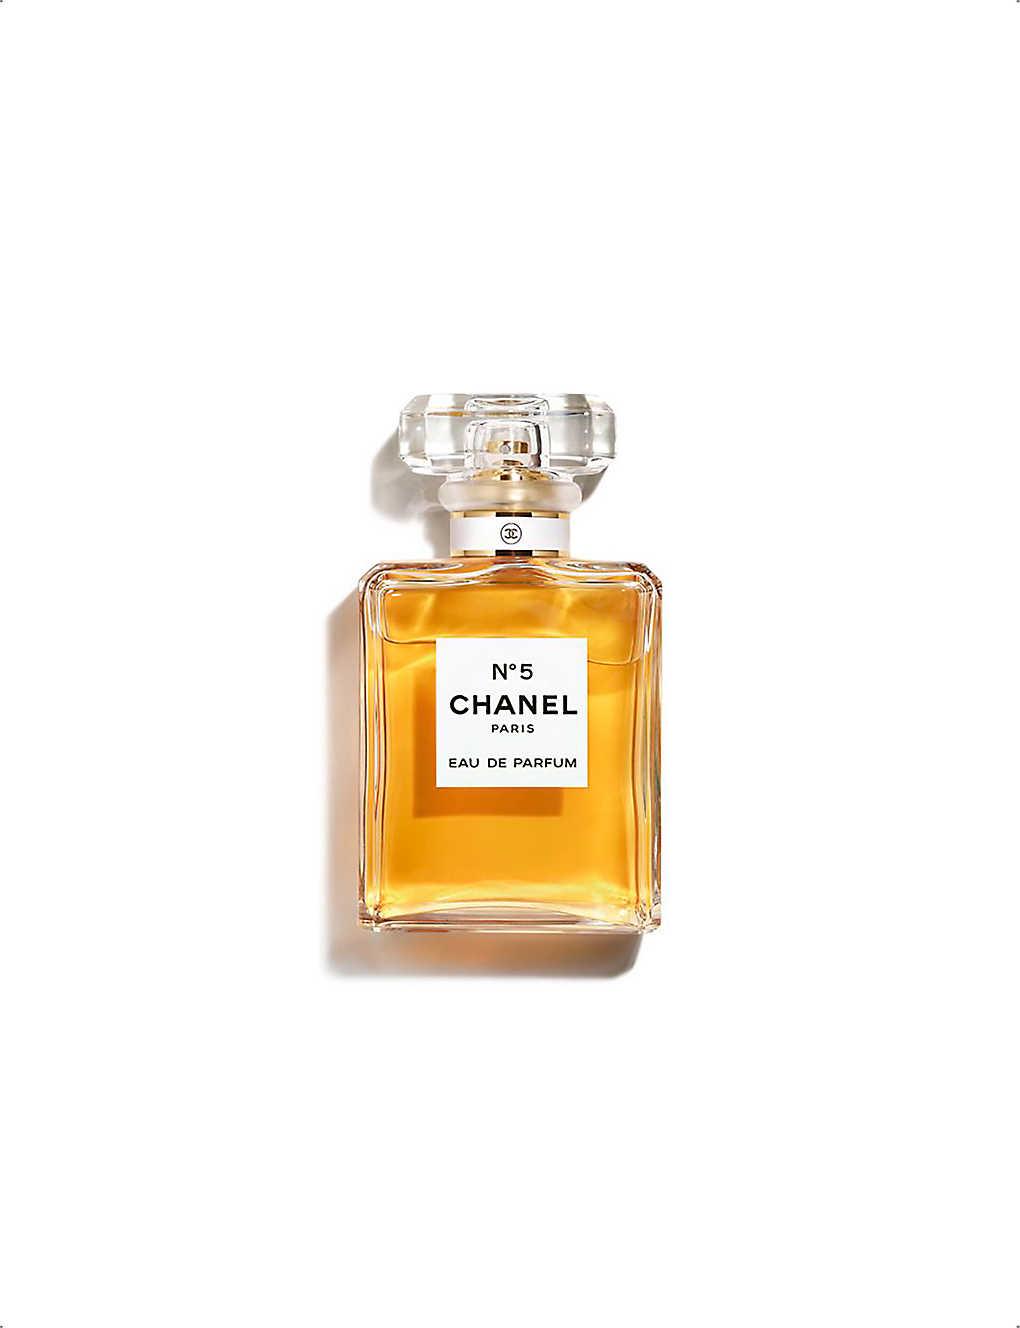 08a0d93e11b CHANEL - N?5 Eau de Parfum Spray 35ml | Selfridges.com